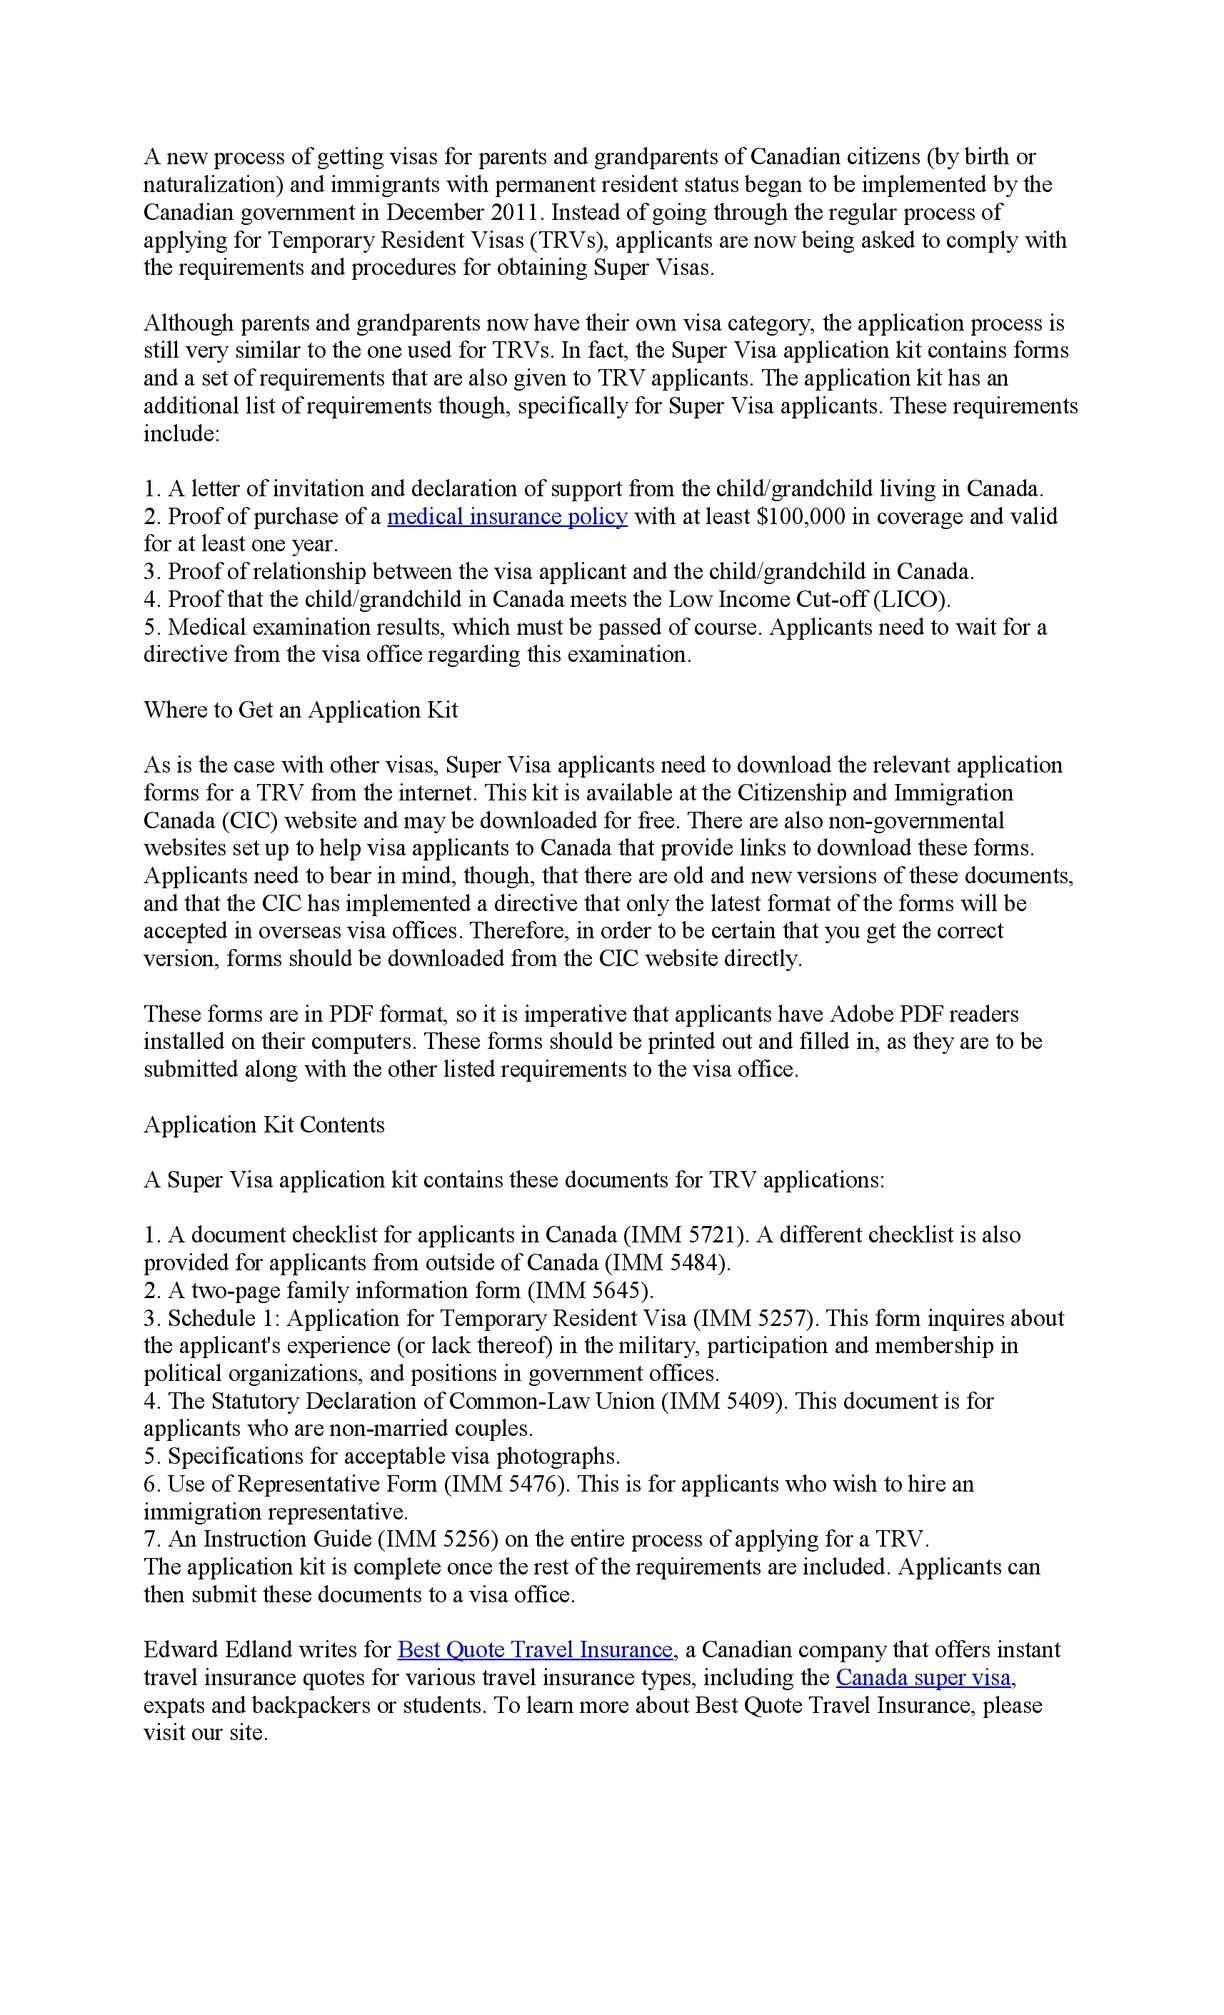 super visa application kit for canada